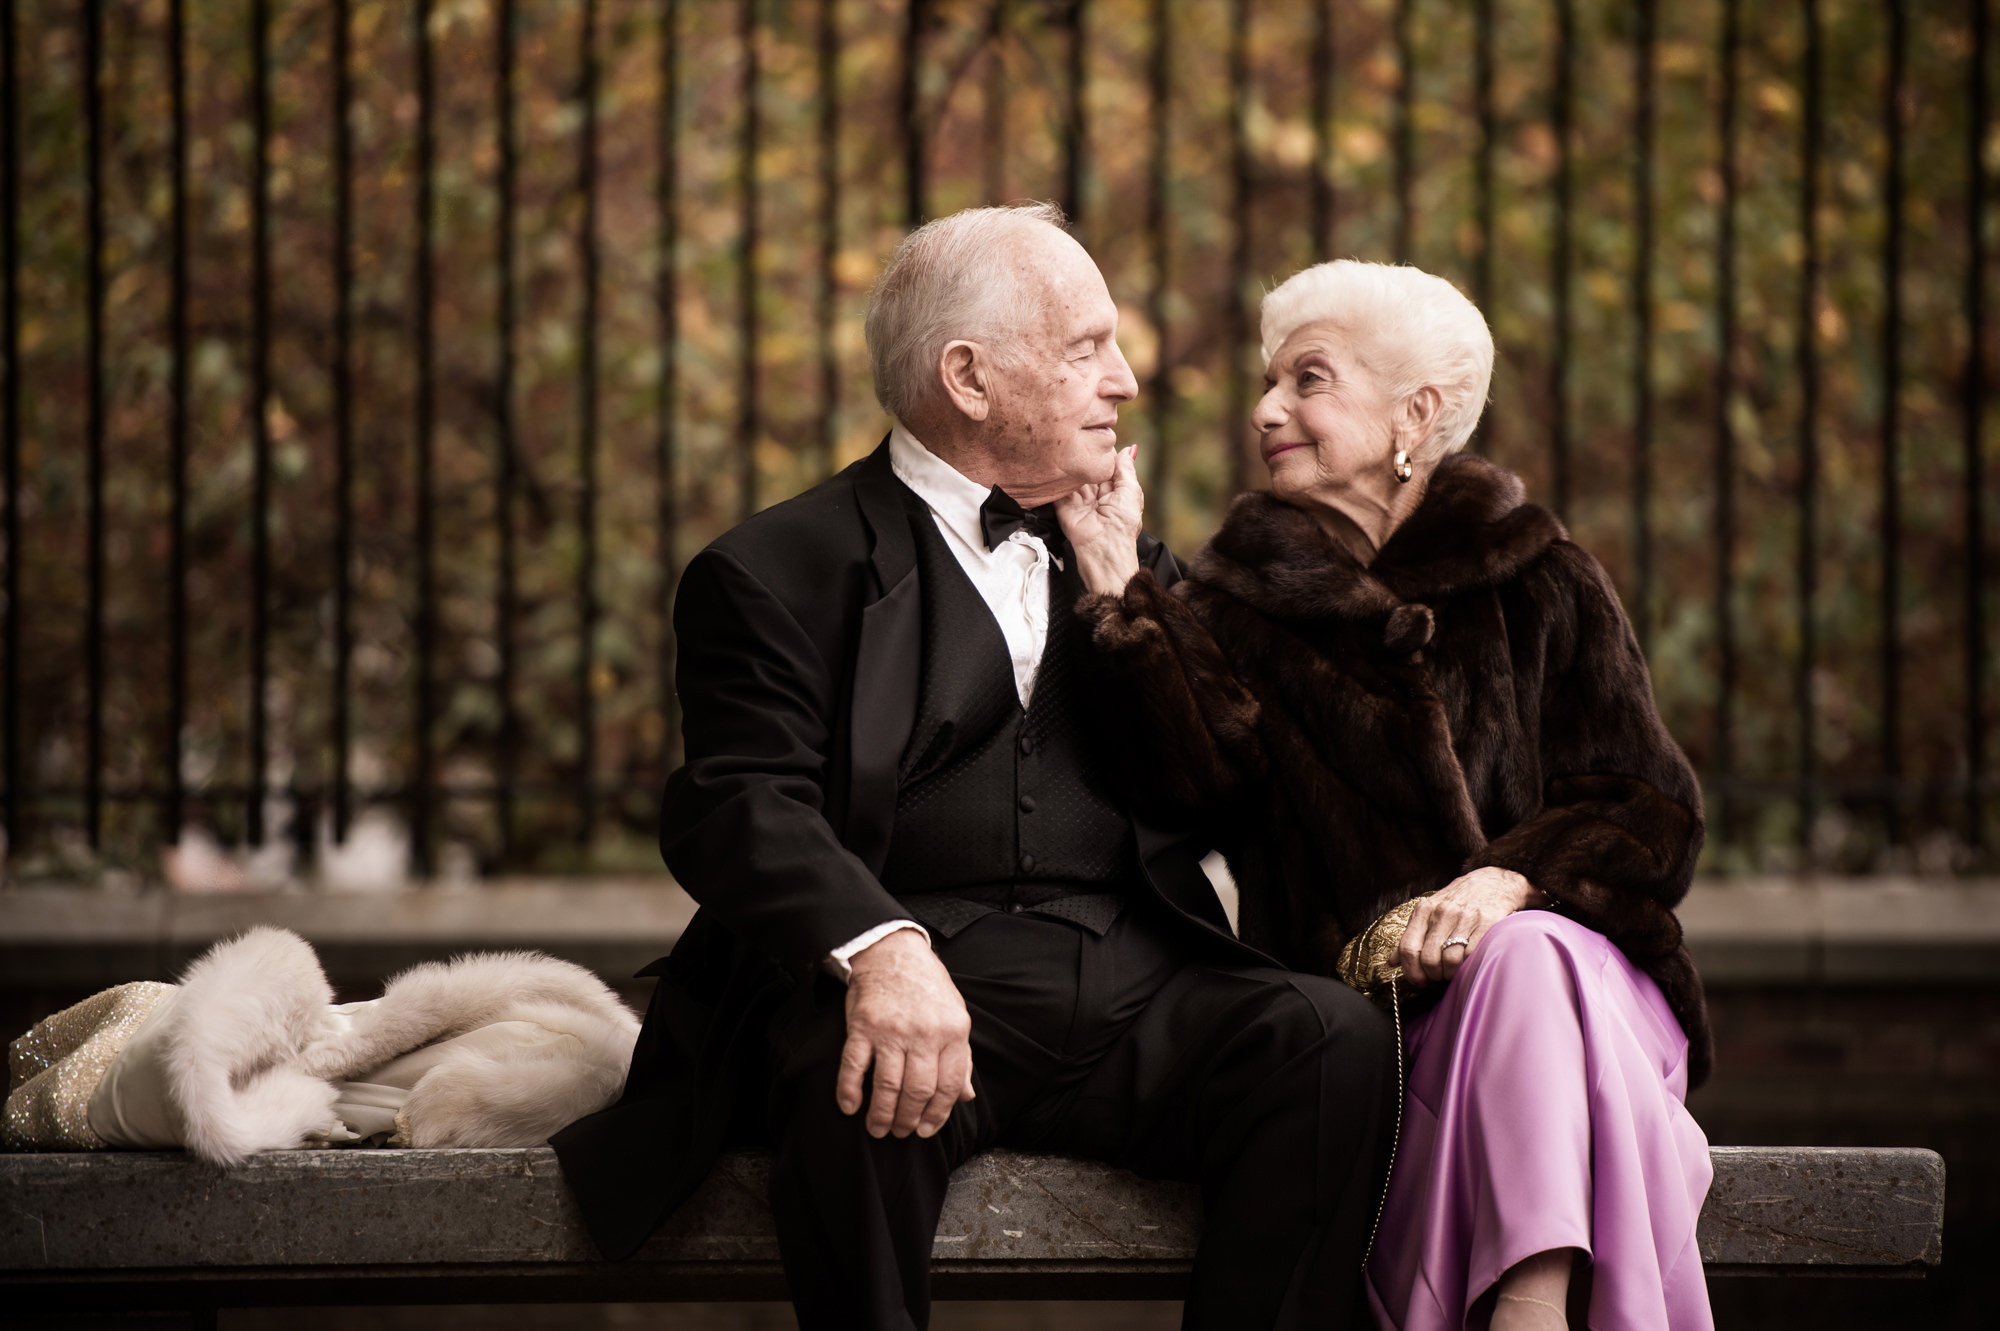 older-bride-and-groom-portrait-loving-touch-worlds-best-wedding-photos-cliff-mautner-new-york-wedding-photographer